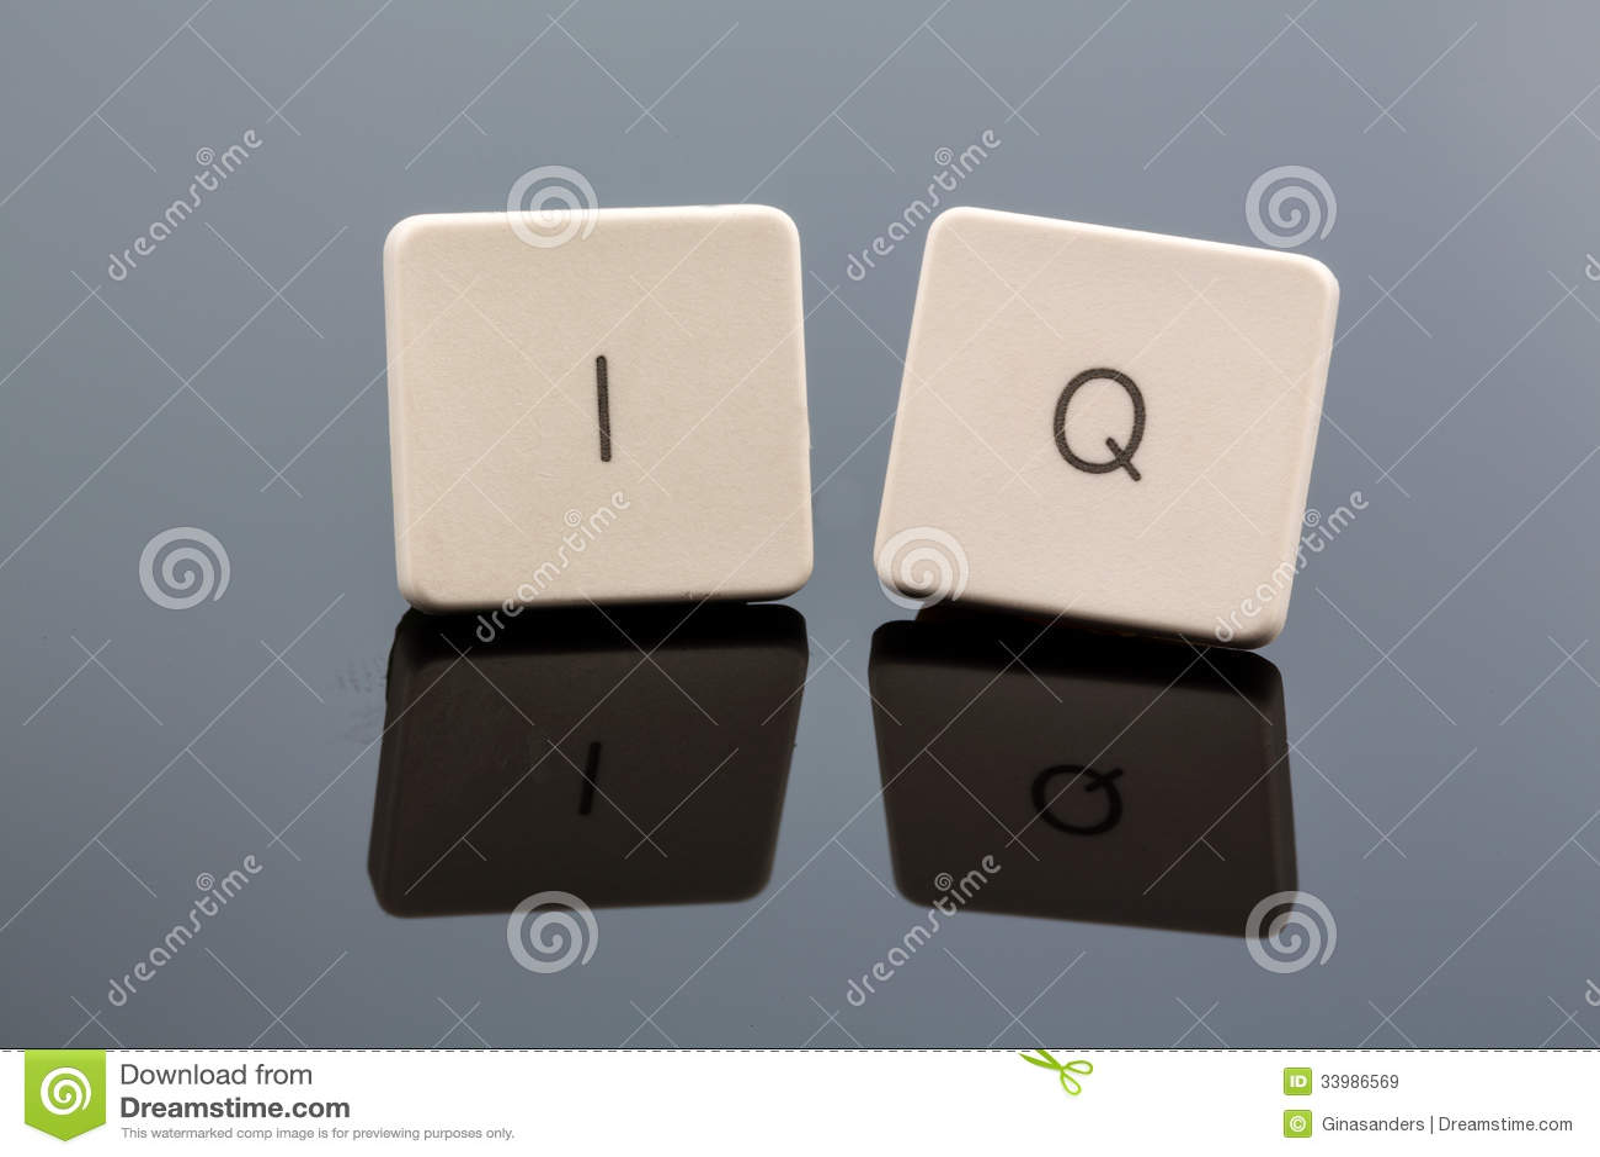 Symbol photo intelligence quotient